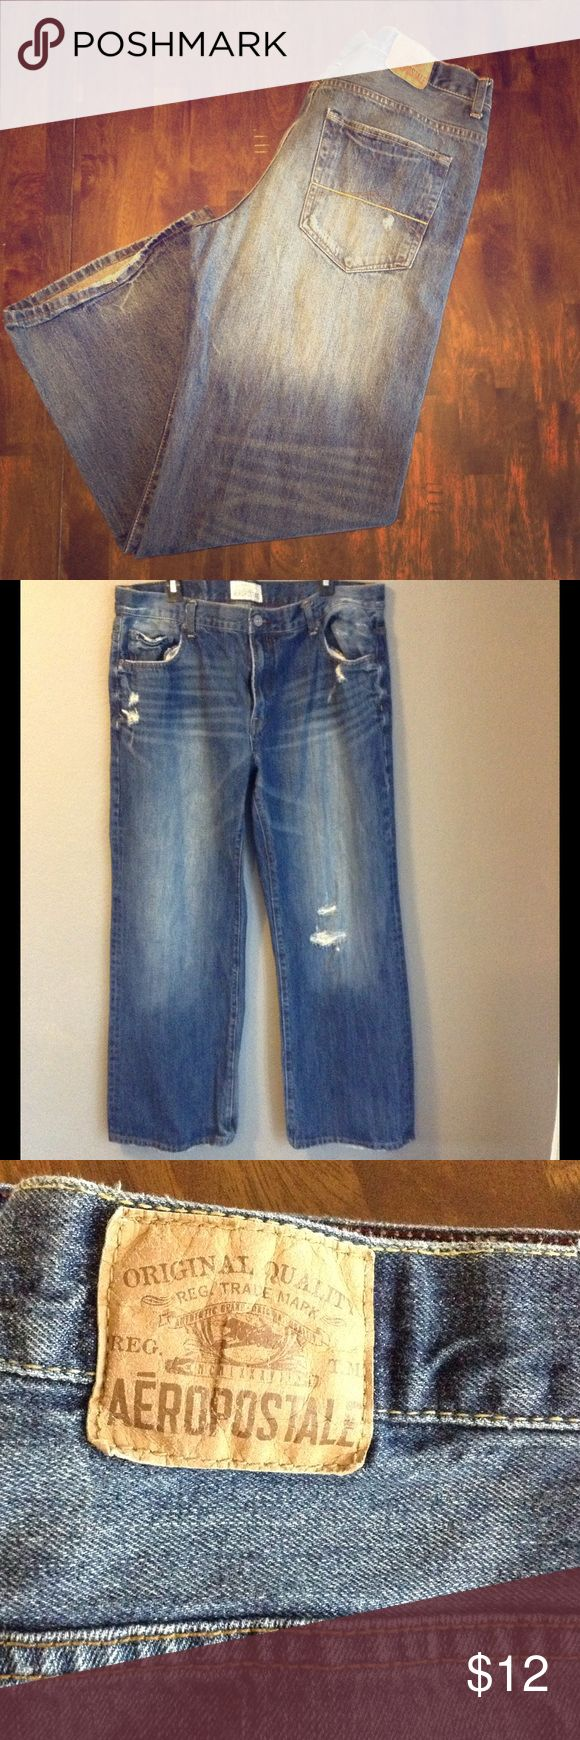 Aeropostale Men's Jeans Bootcut 38x32 Aeropostale Benton Original Bootcut jeans for men 38x32 in great condition. Aeropostale Jeans Bootcut